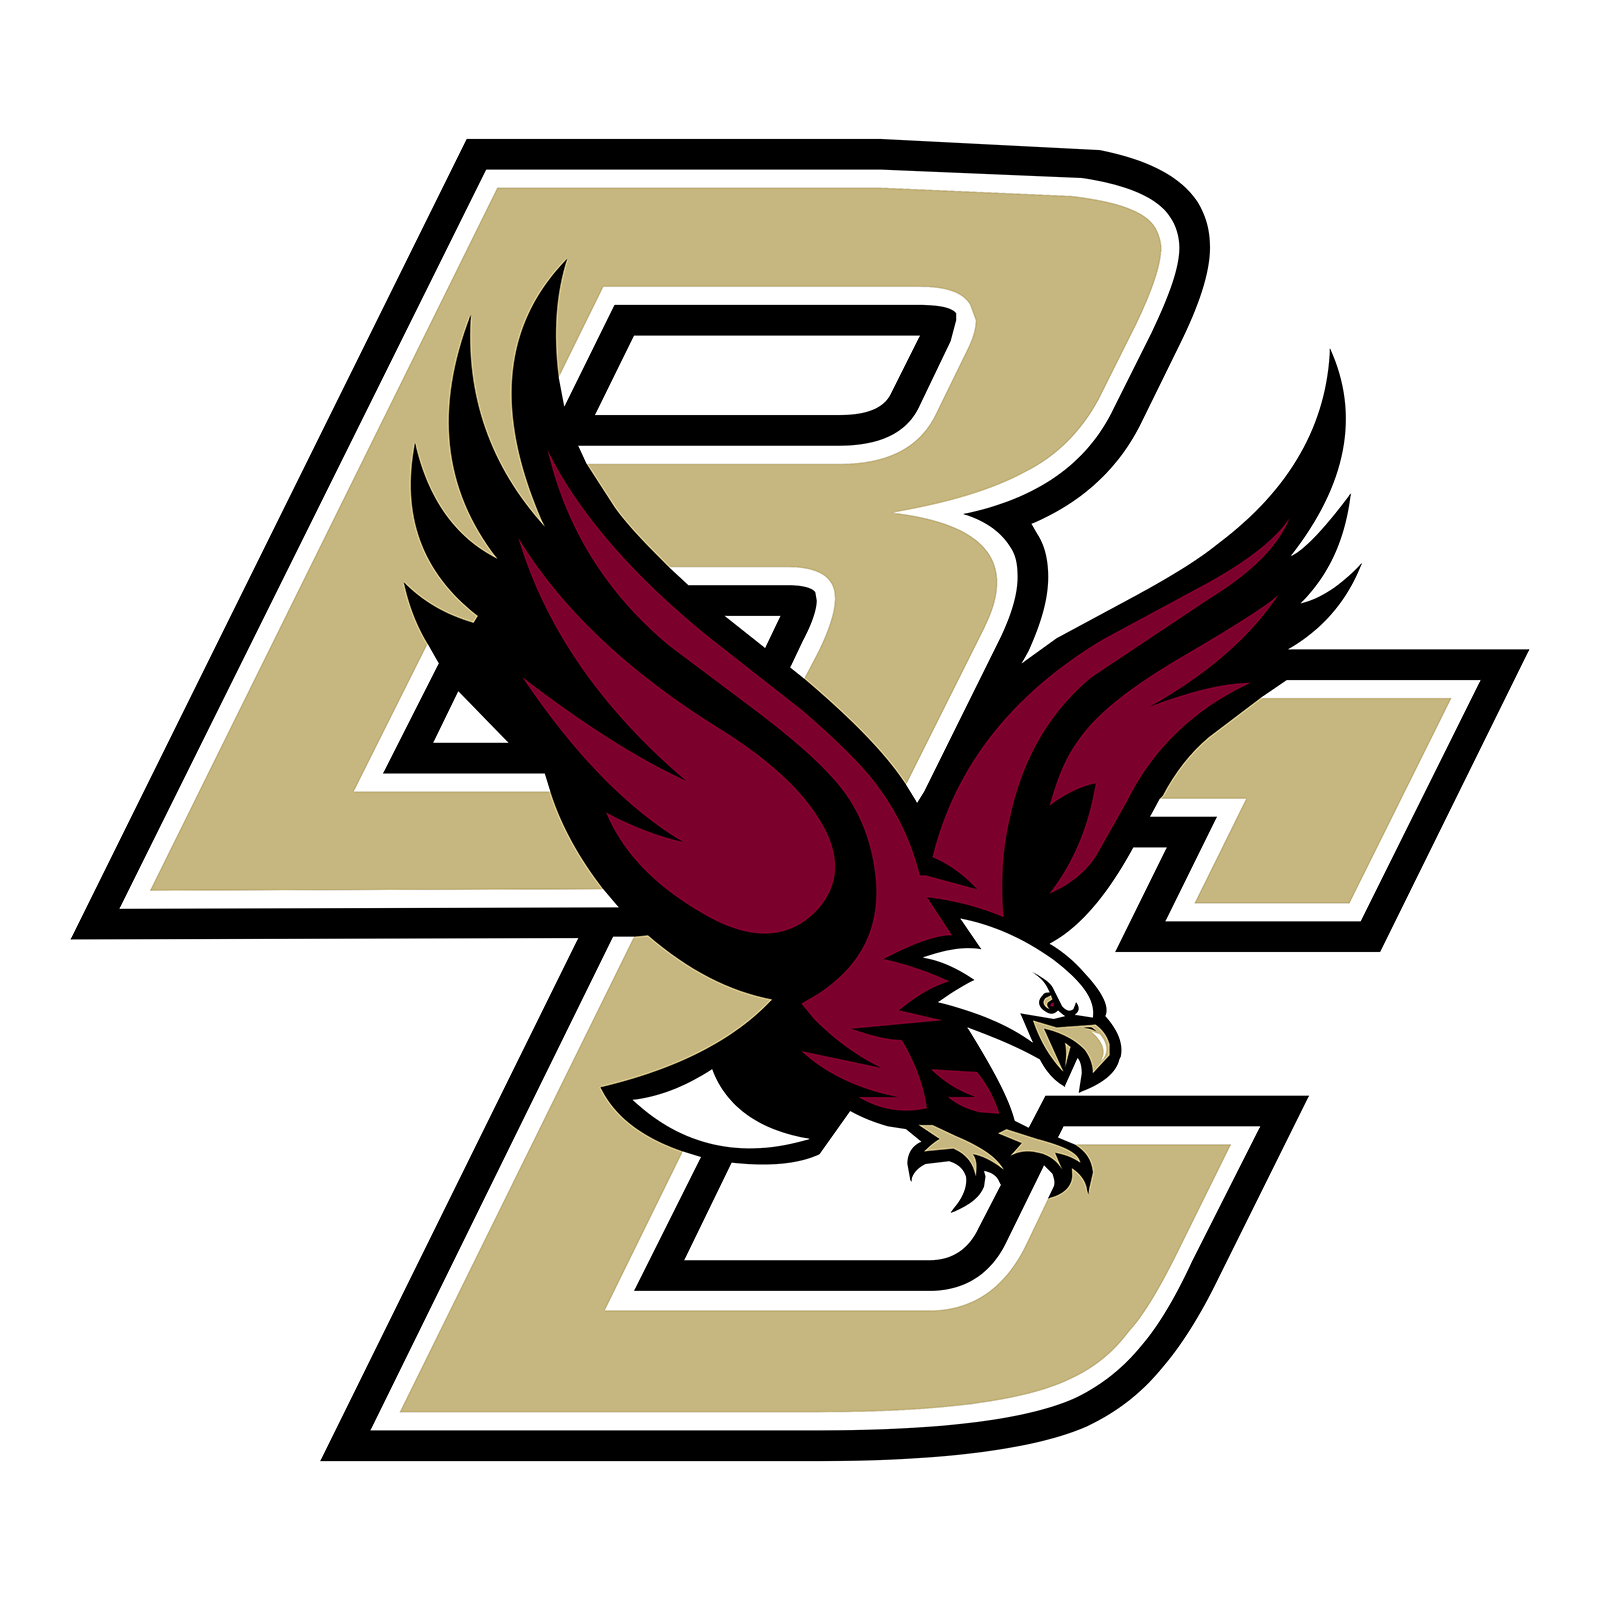 BC_Eagles_logo